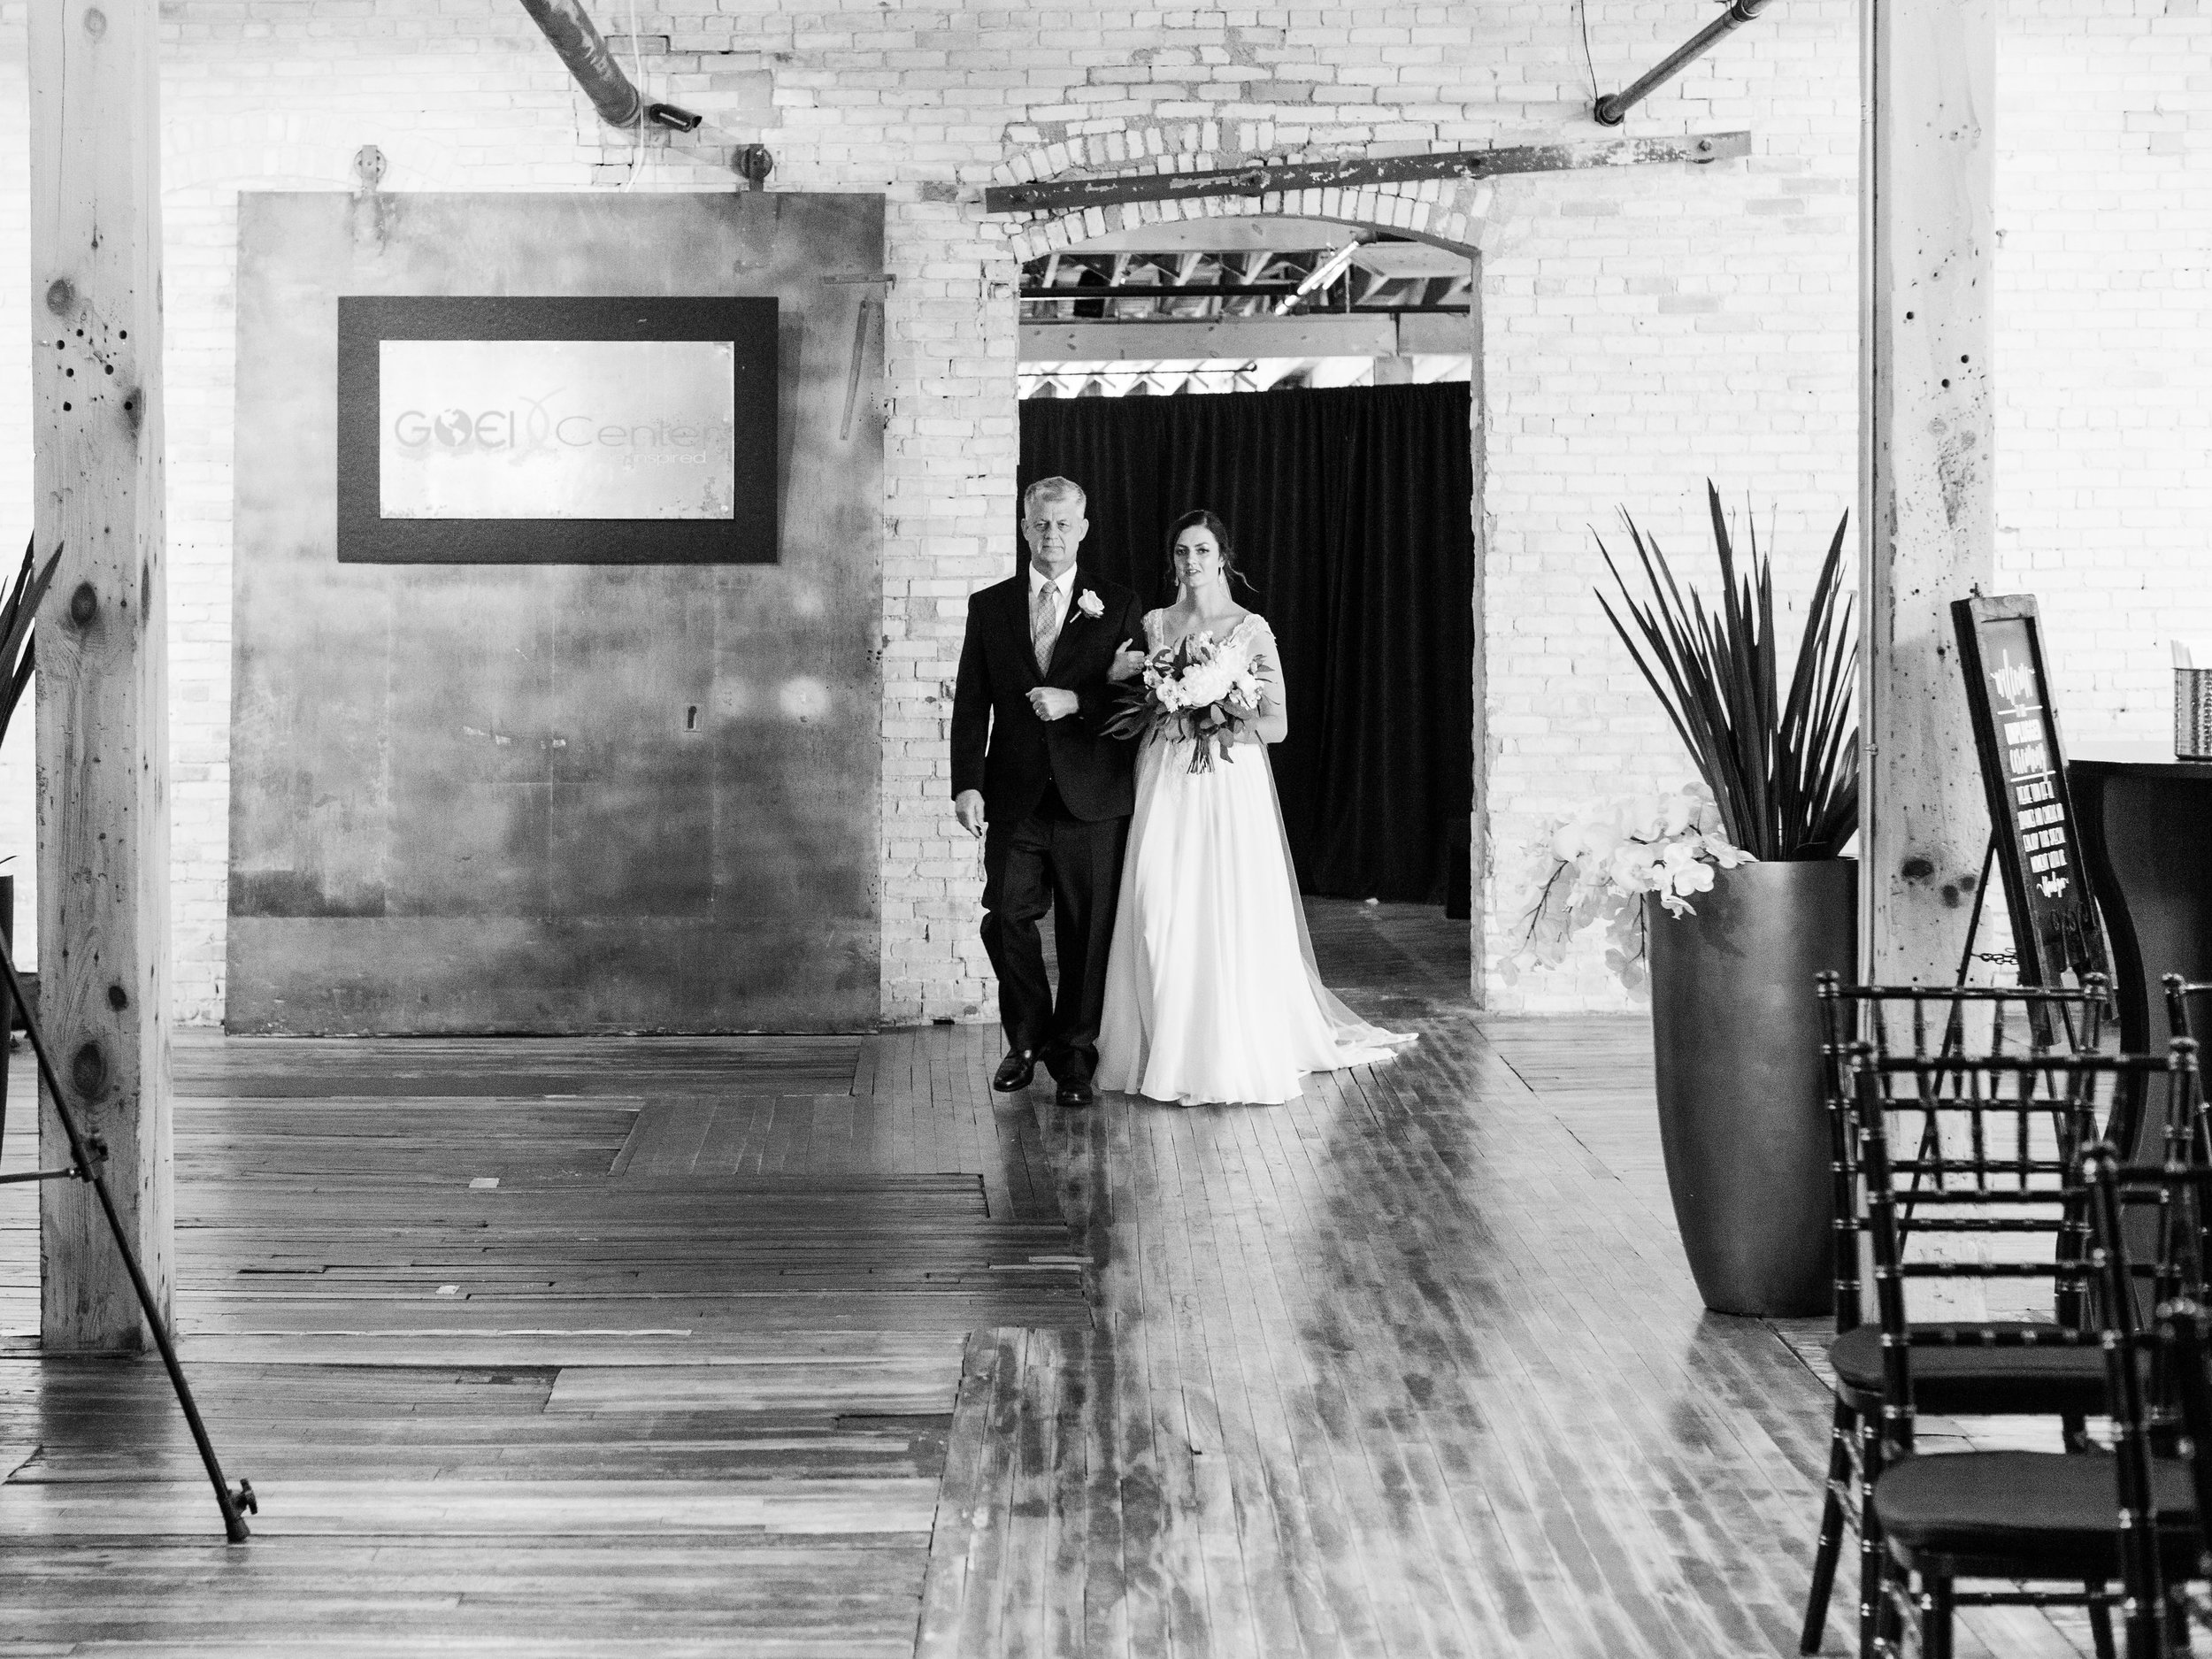 Julius+Wedding+Ceremony-40.jpg